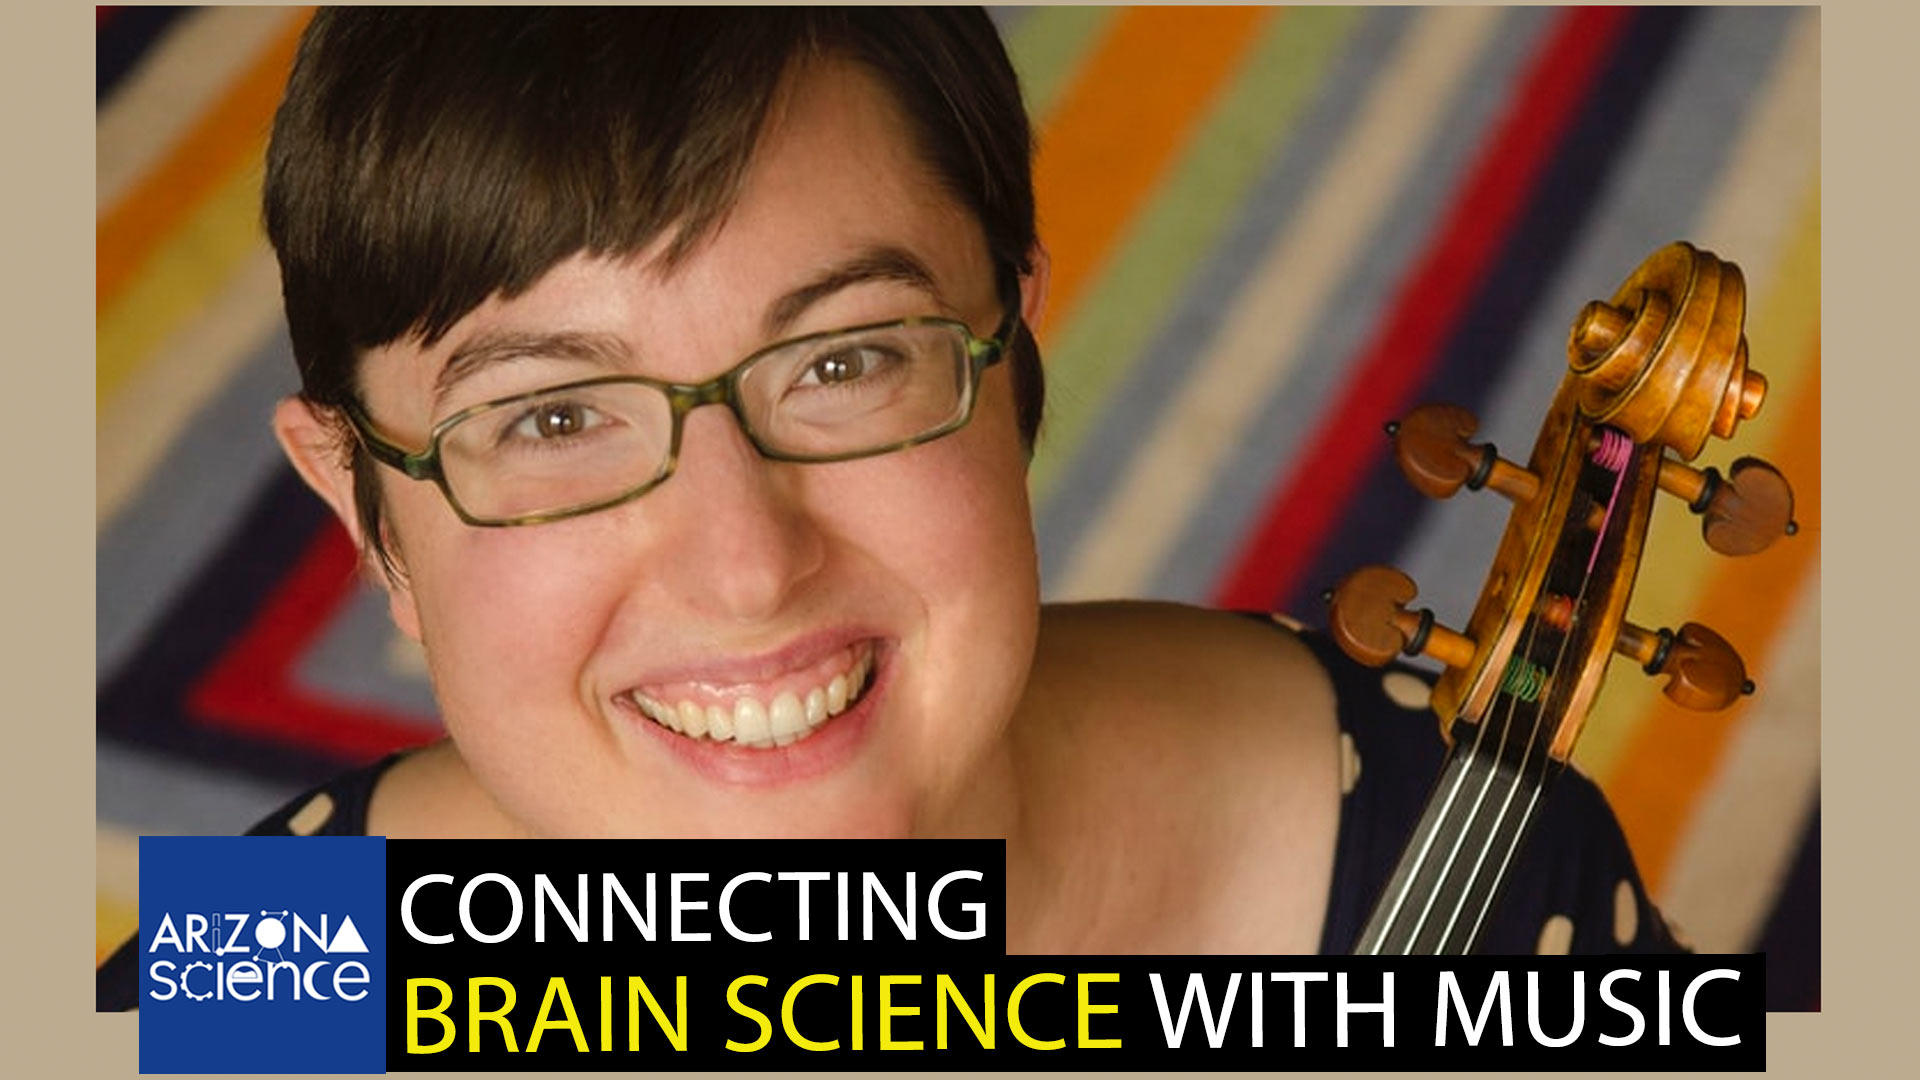 UA music professor Molly Gebrian